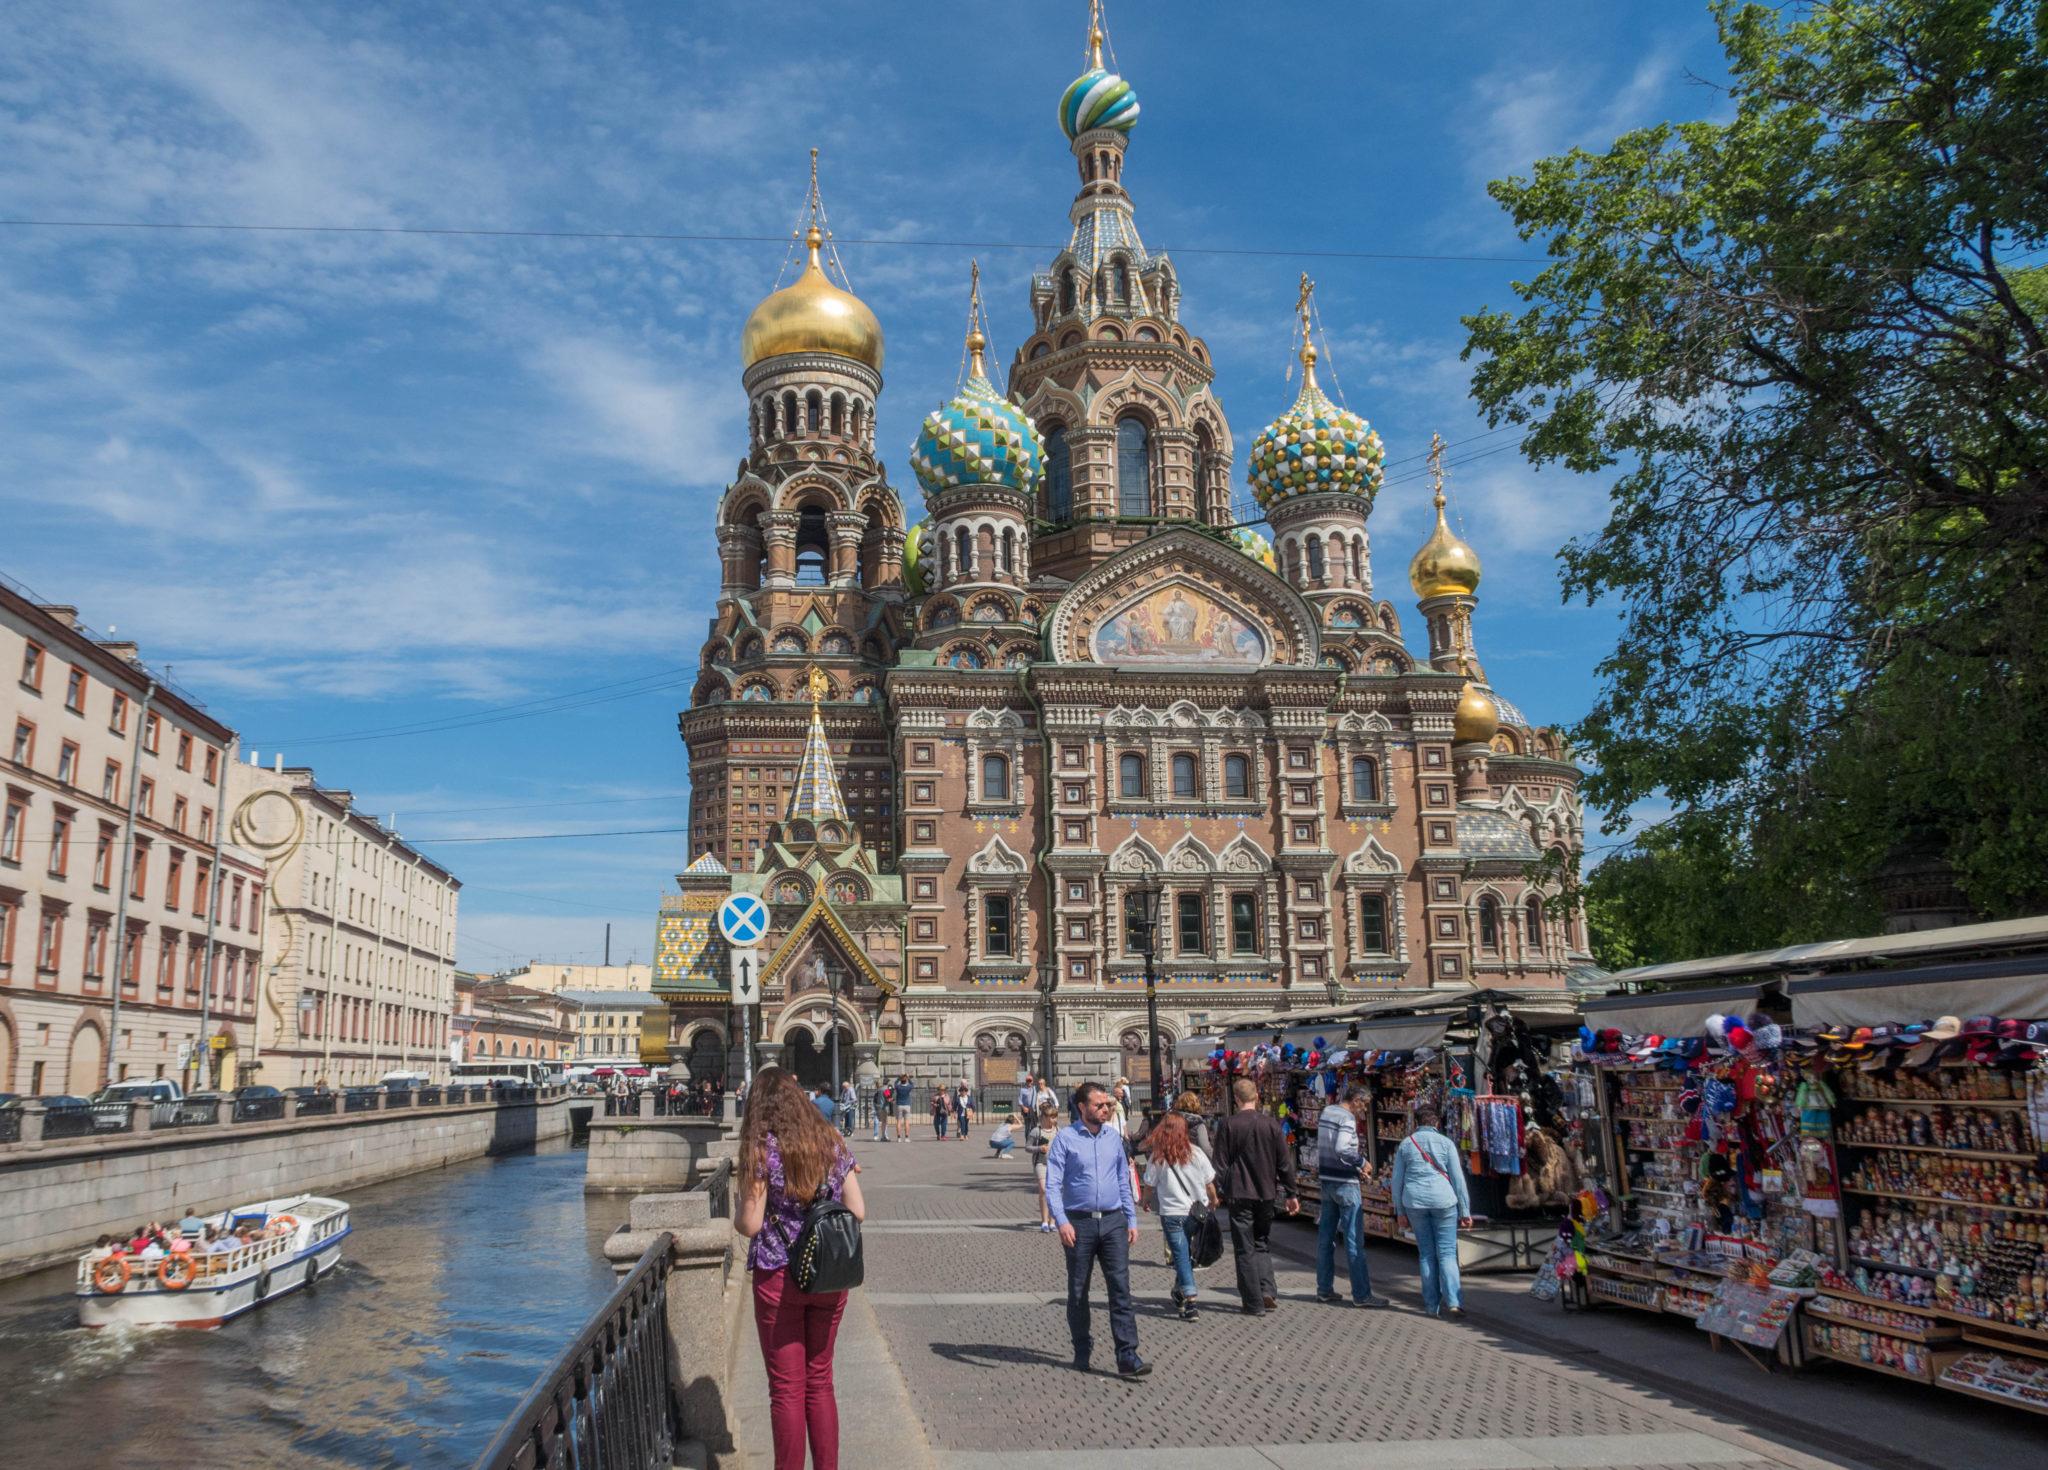 St. Petersburg and the Nevsky Prospect